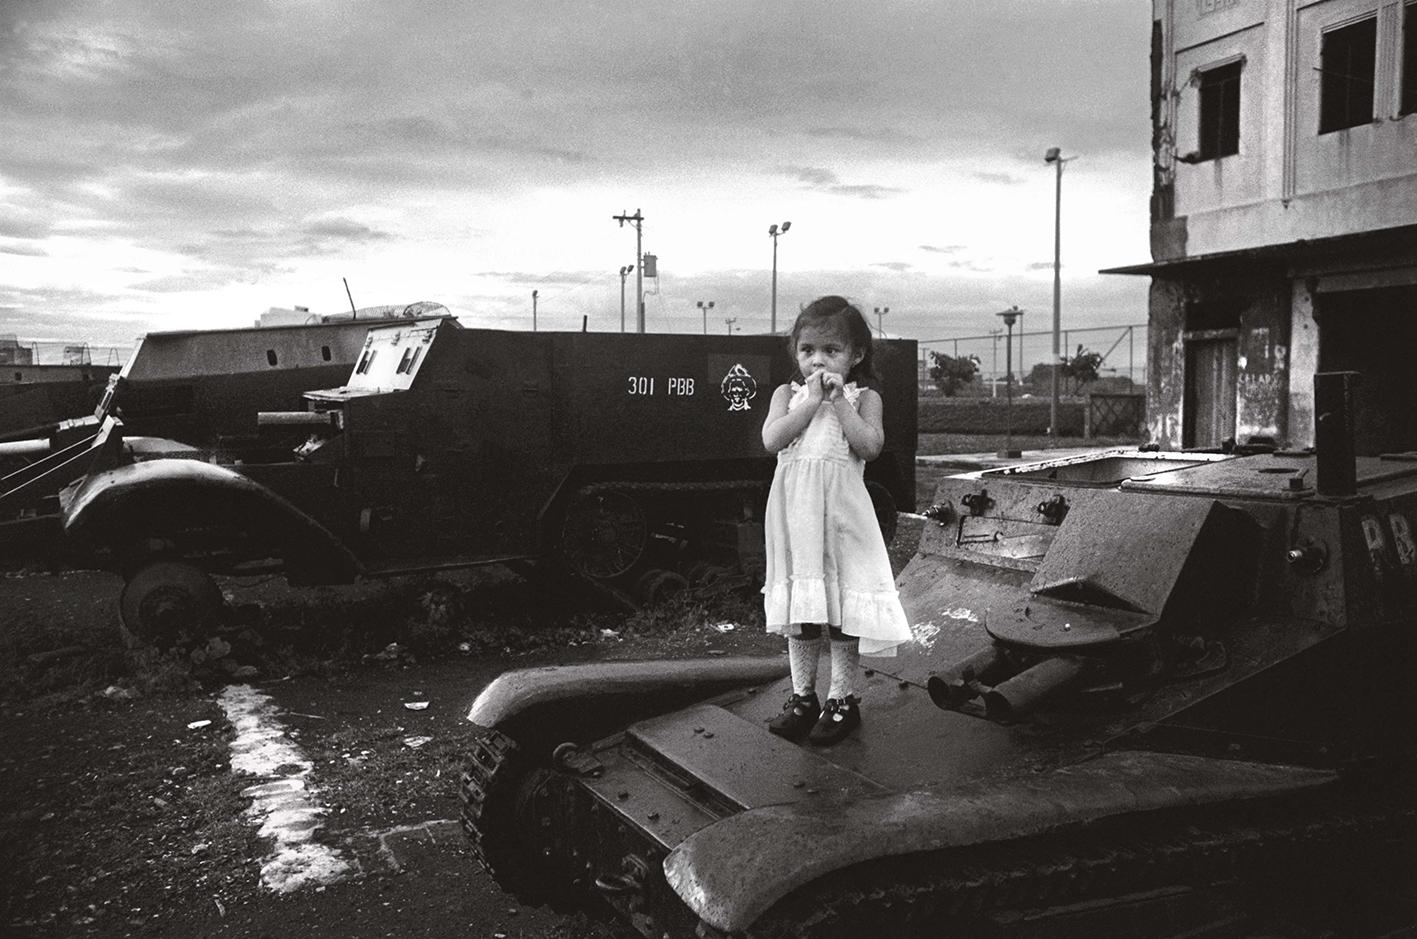 &#169Christine Spengler - Nicaragua, 1981. Managua.